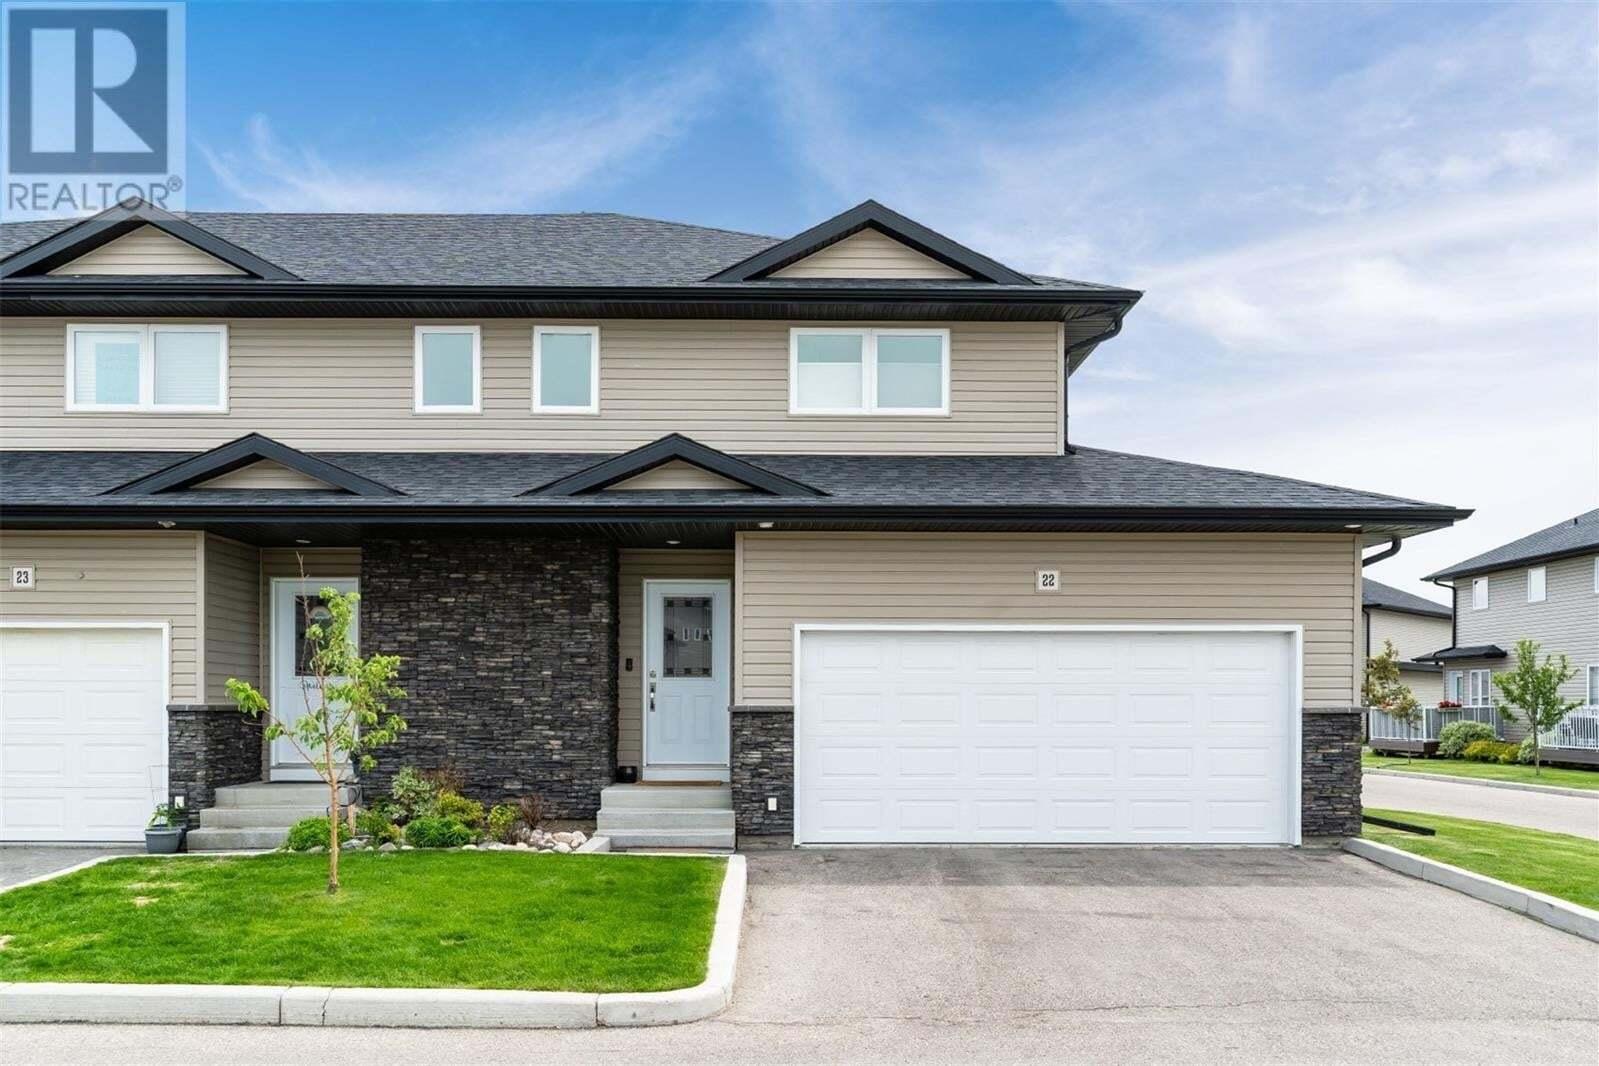 Townhouse for sale at 365 Dawson Cres Unit 22 Saskatoon Saskatchewan - MLS: SK814139